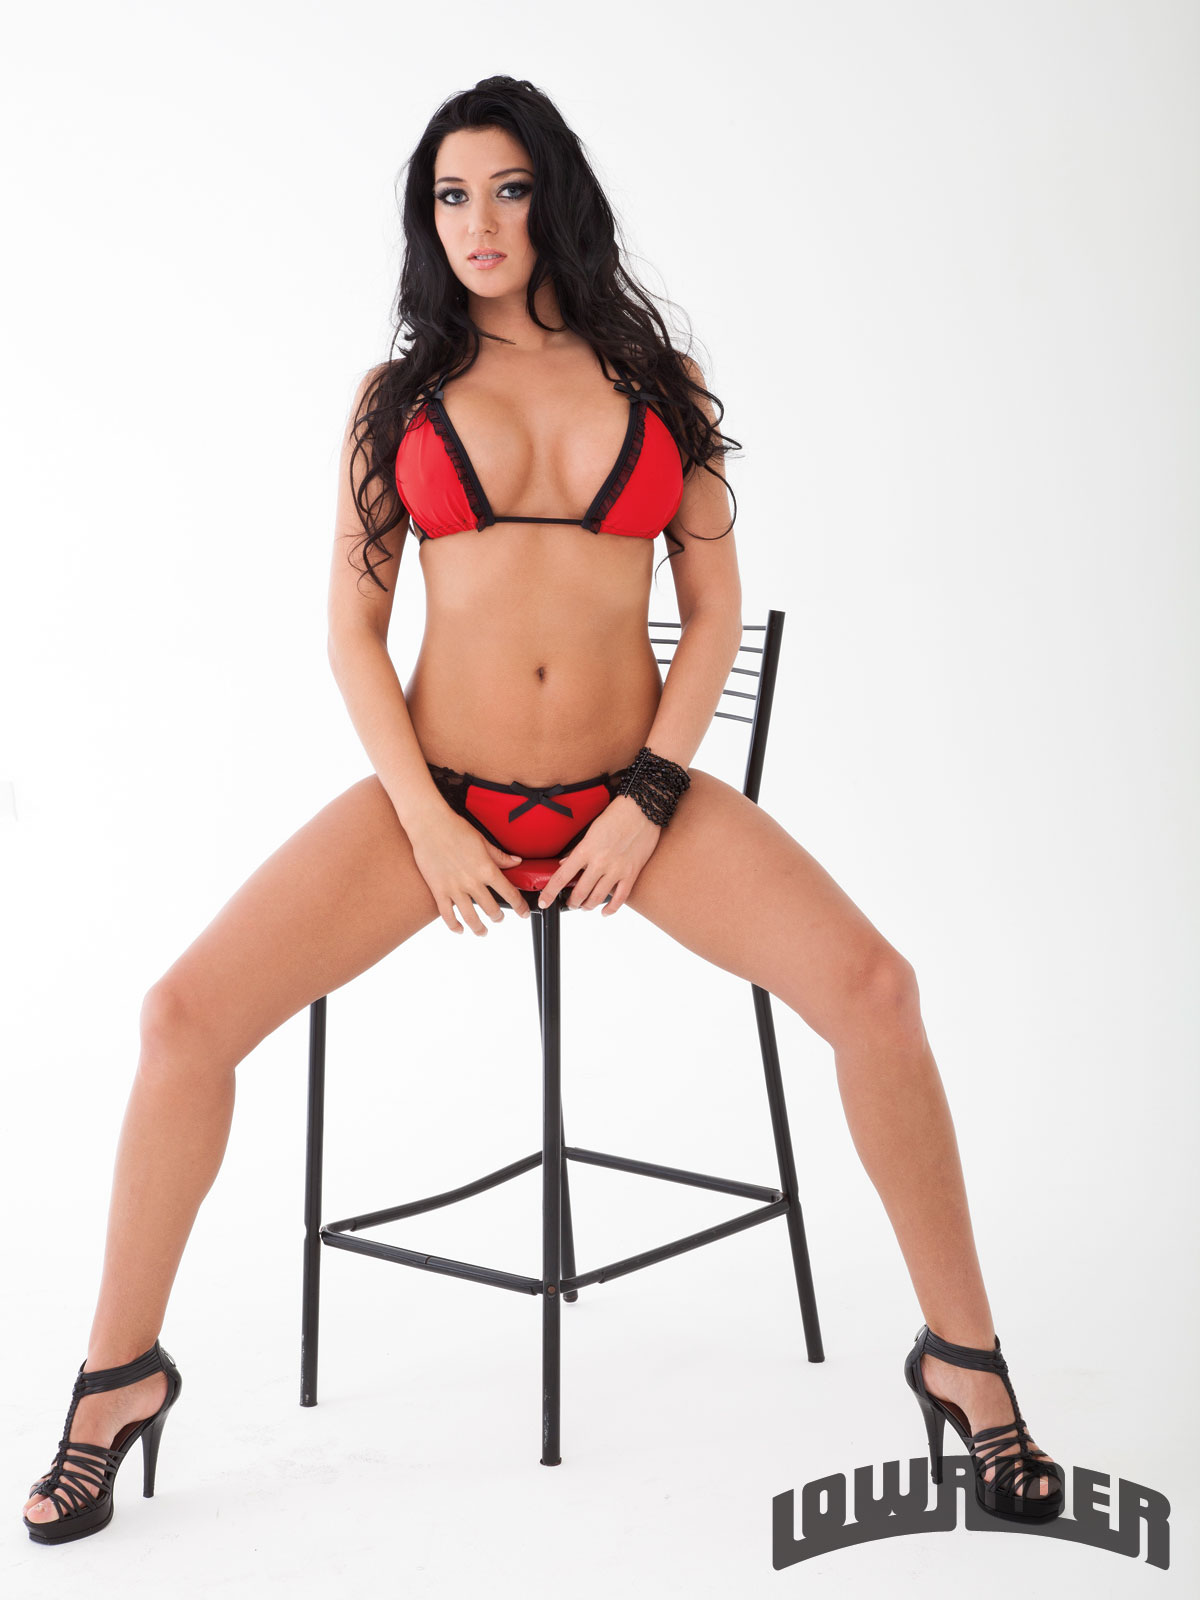 Lowrider model porno pics, jappanes boombes gales photos